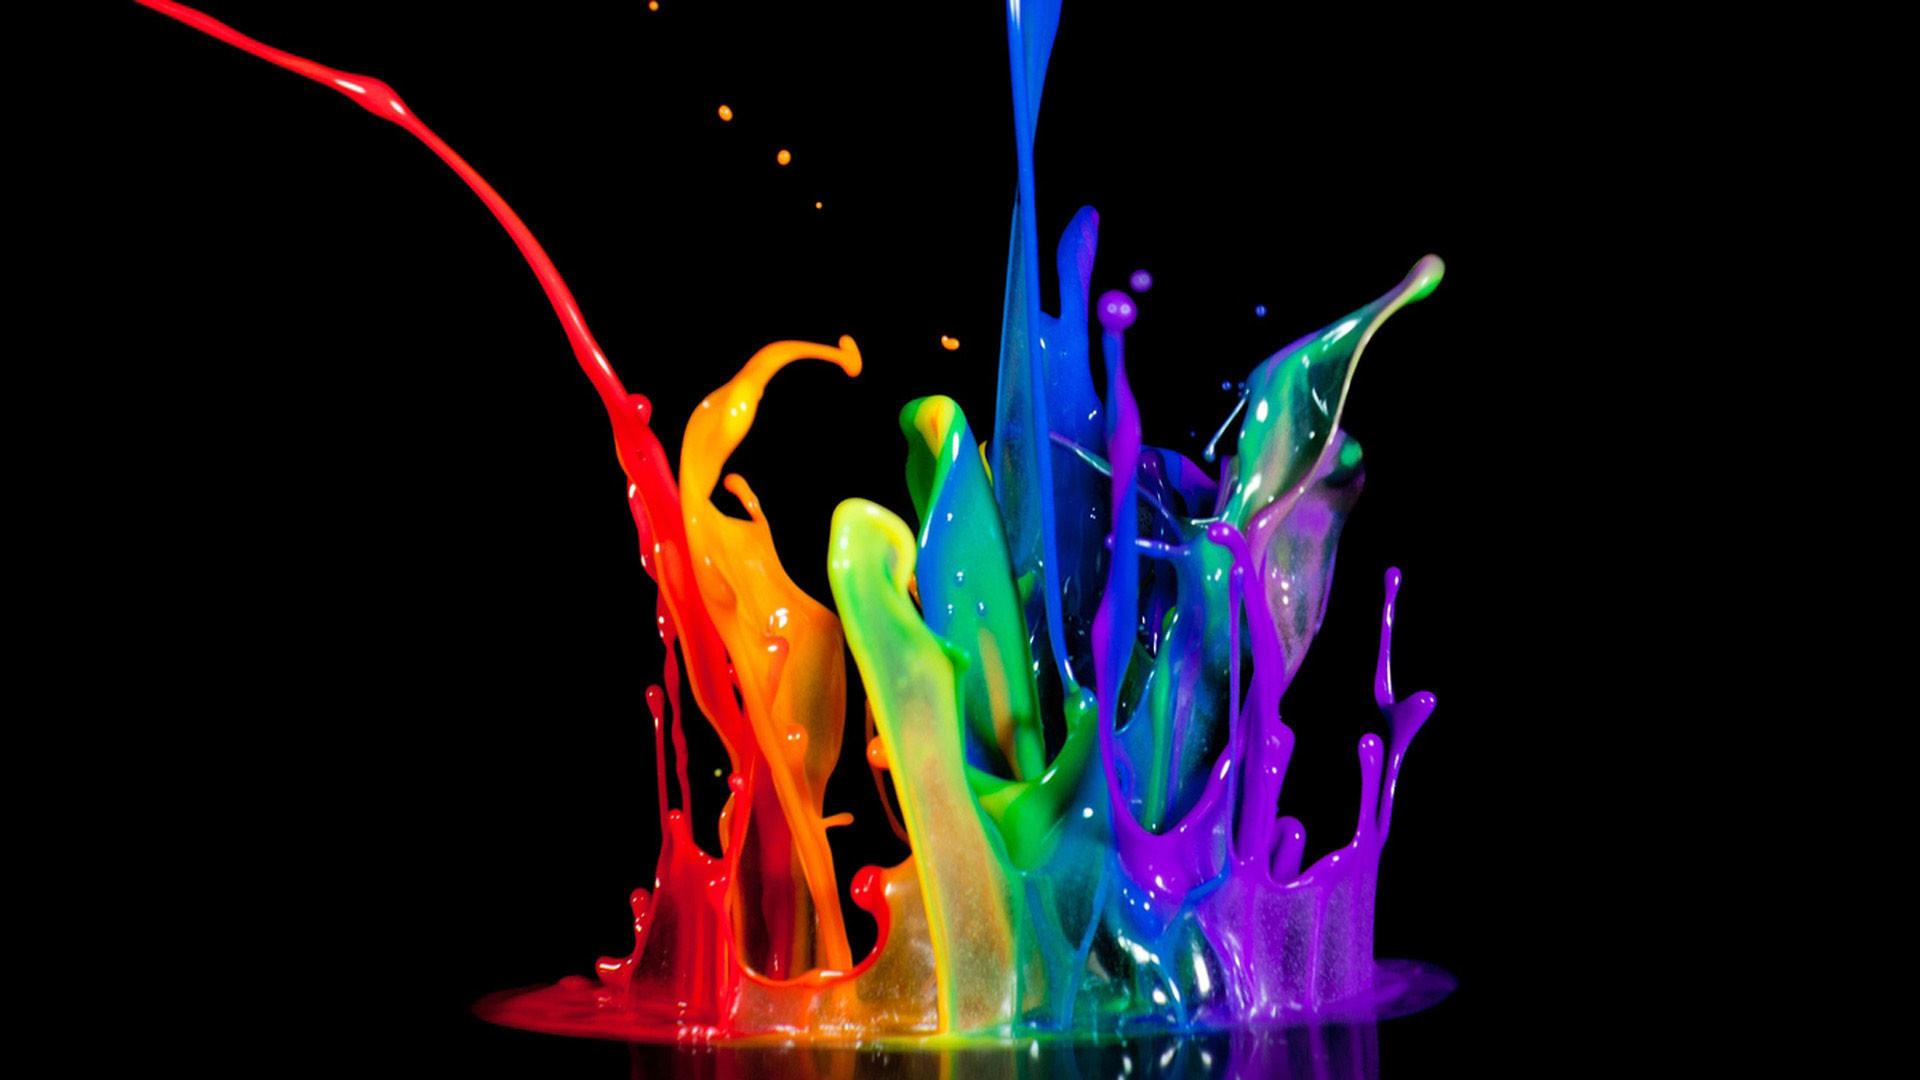 hd pics photos abstract color splash desktop background wallpaper